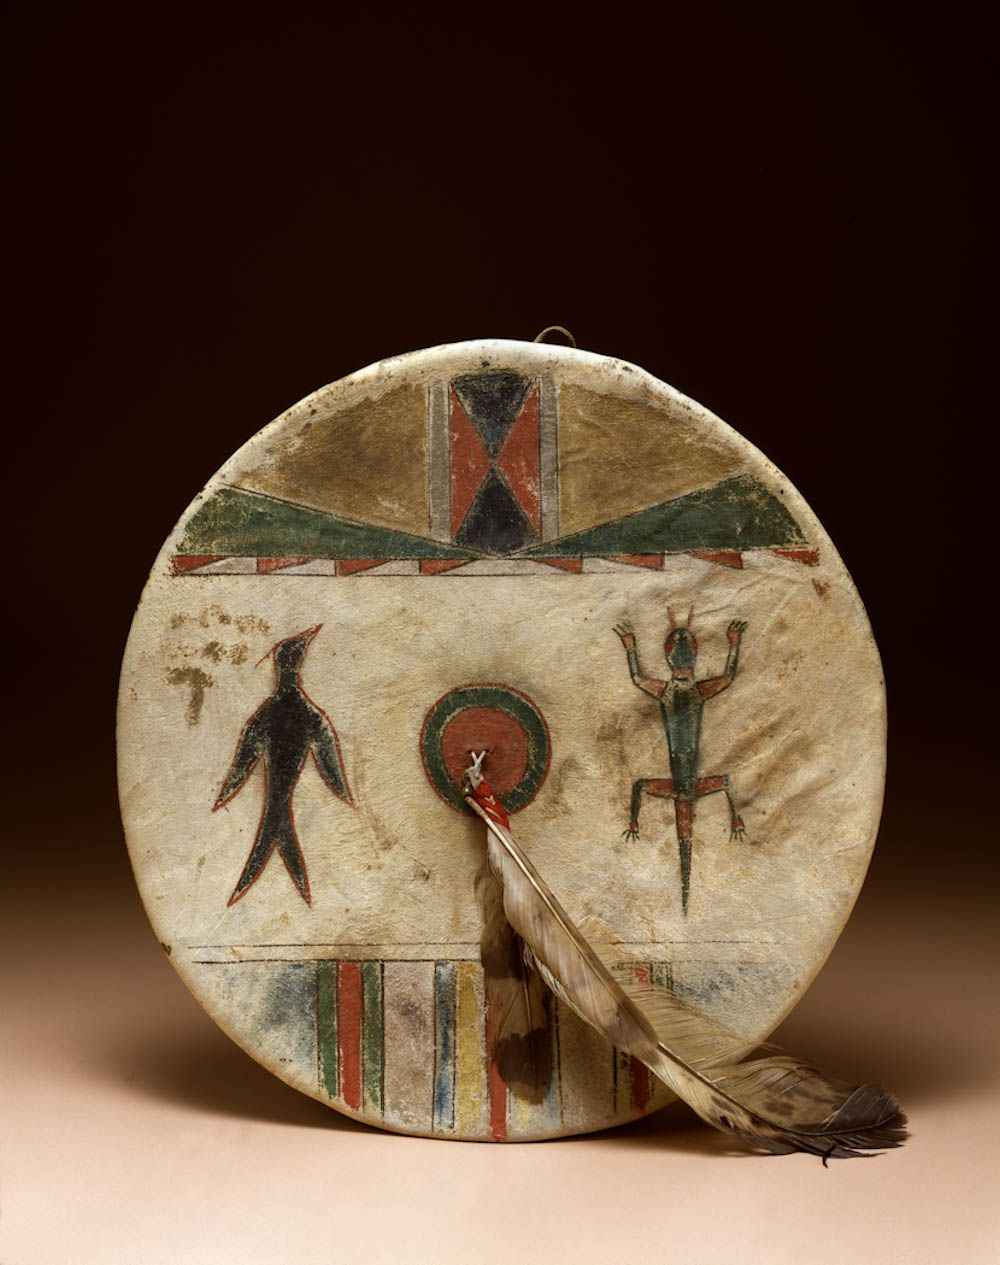 Tsitsistas cheyenne artist shield cover 19th century for Cheyenne tribe arts and crafts